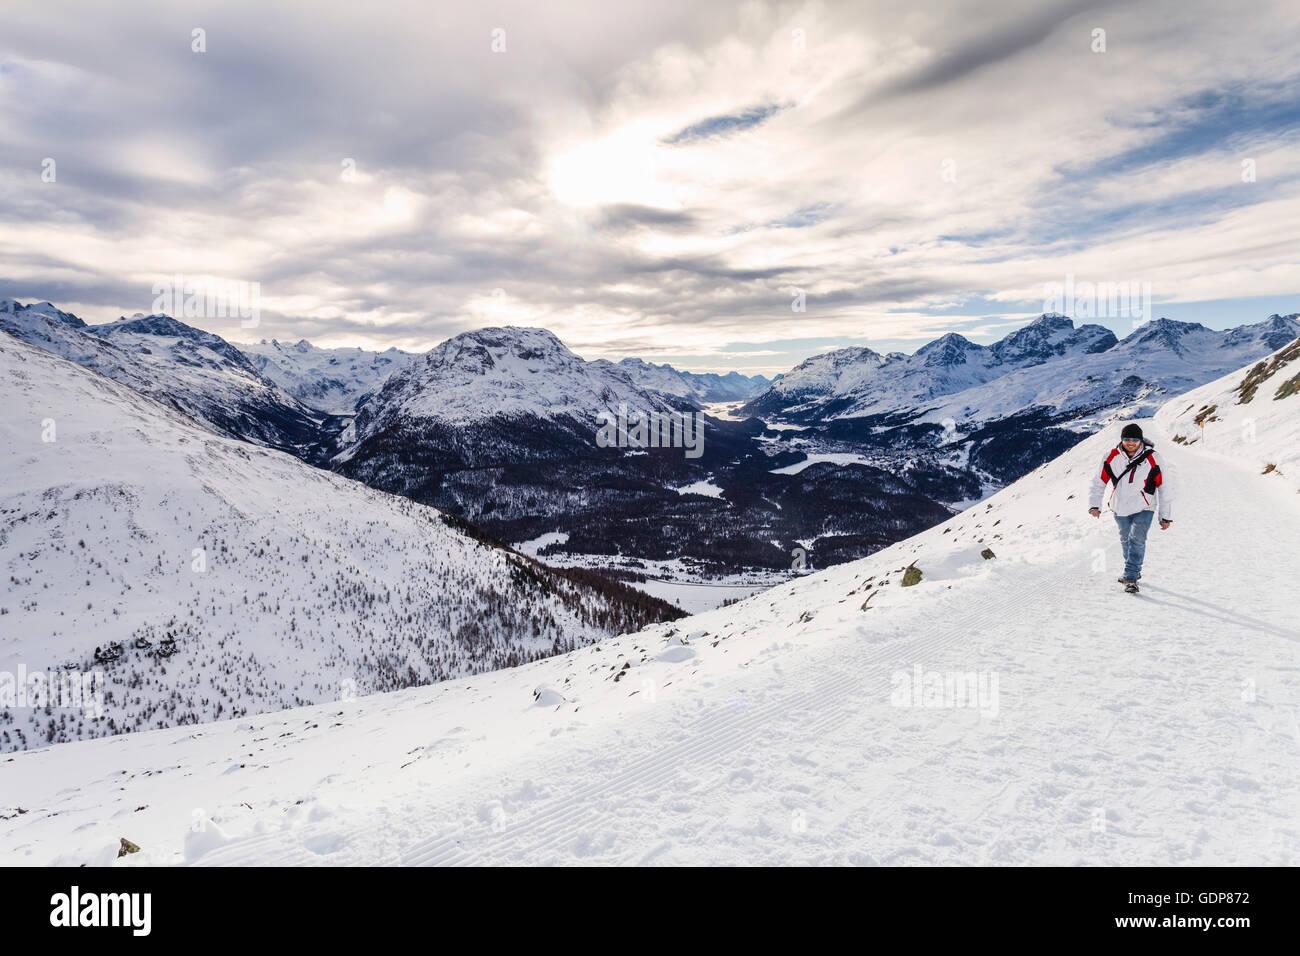 Man walking on snow covered mountain, rear view, Engadine, Switzerland - Stock Image